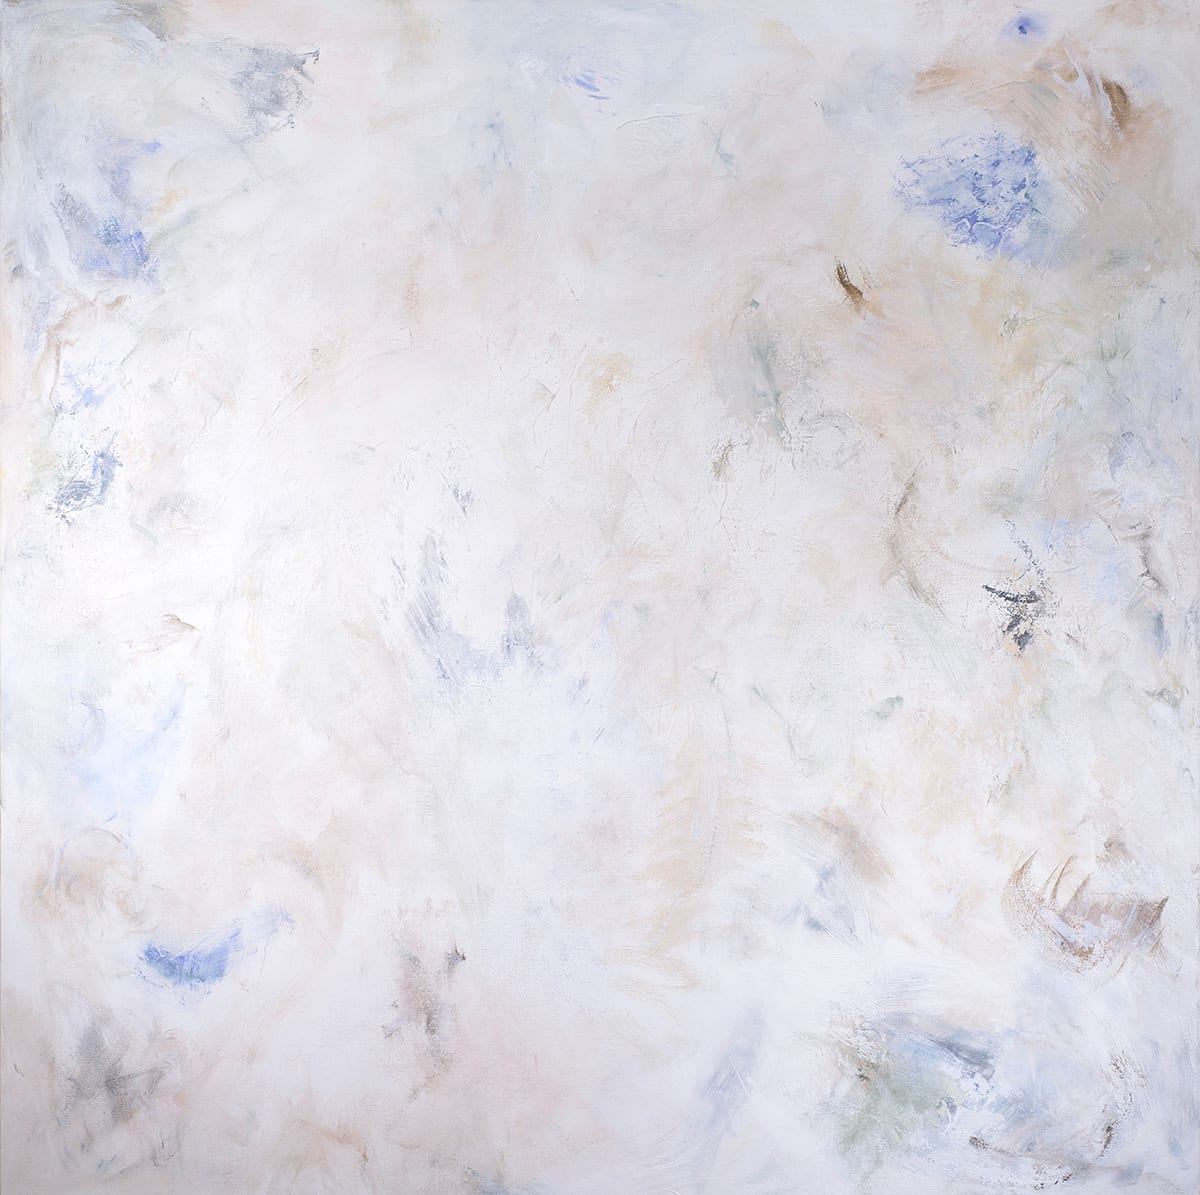 Patricia Qualls, Presence, 2016